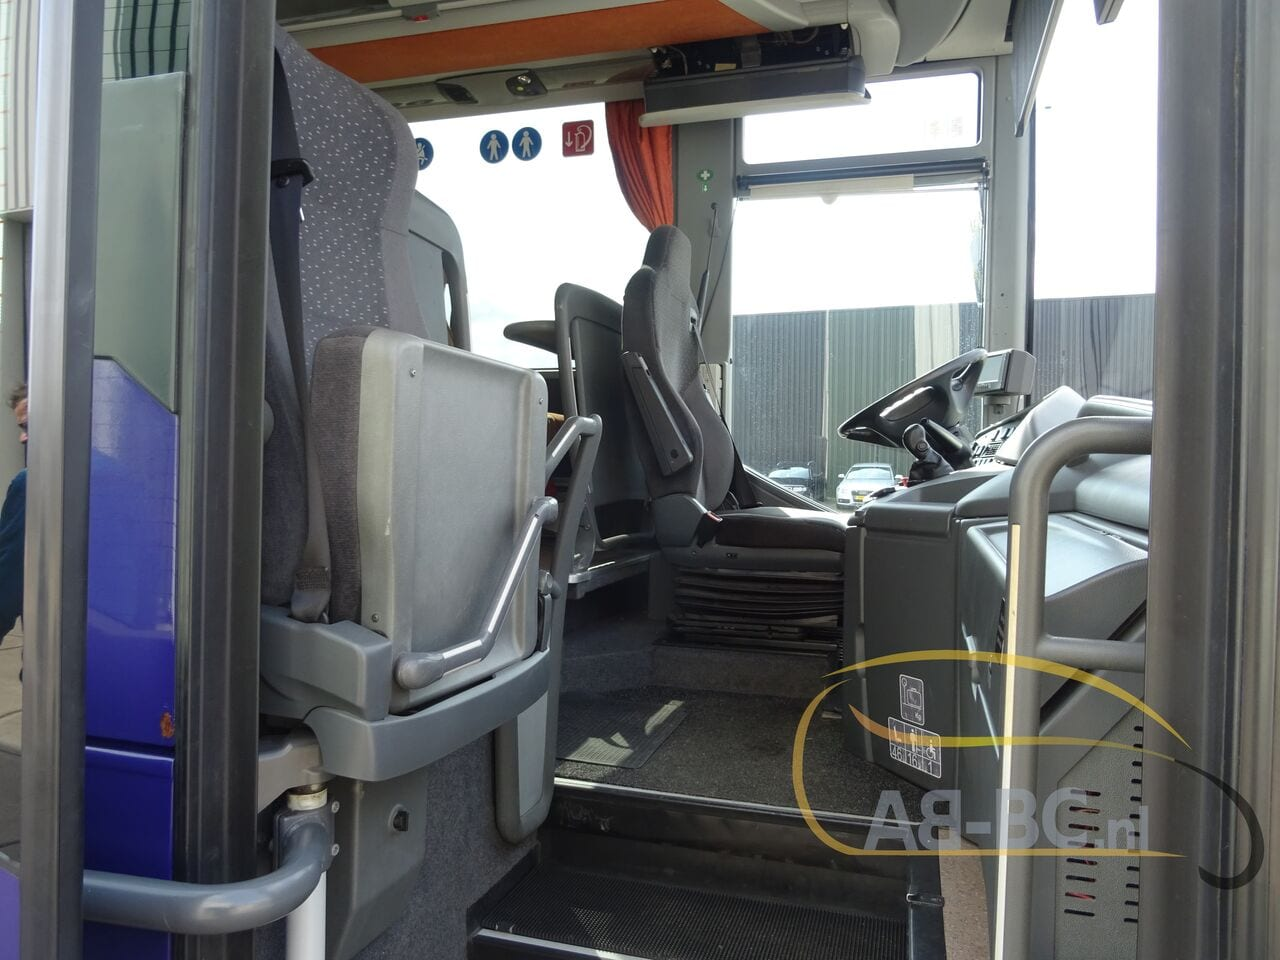 coach-busSETRA-S416H-48-SEATS-LIFTBUS---1620309712747175195_big_24679d31dbc3bc929bf8efede7874c25--21050616581387095000